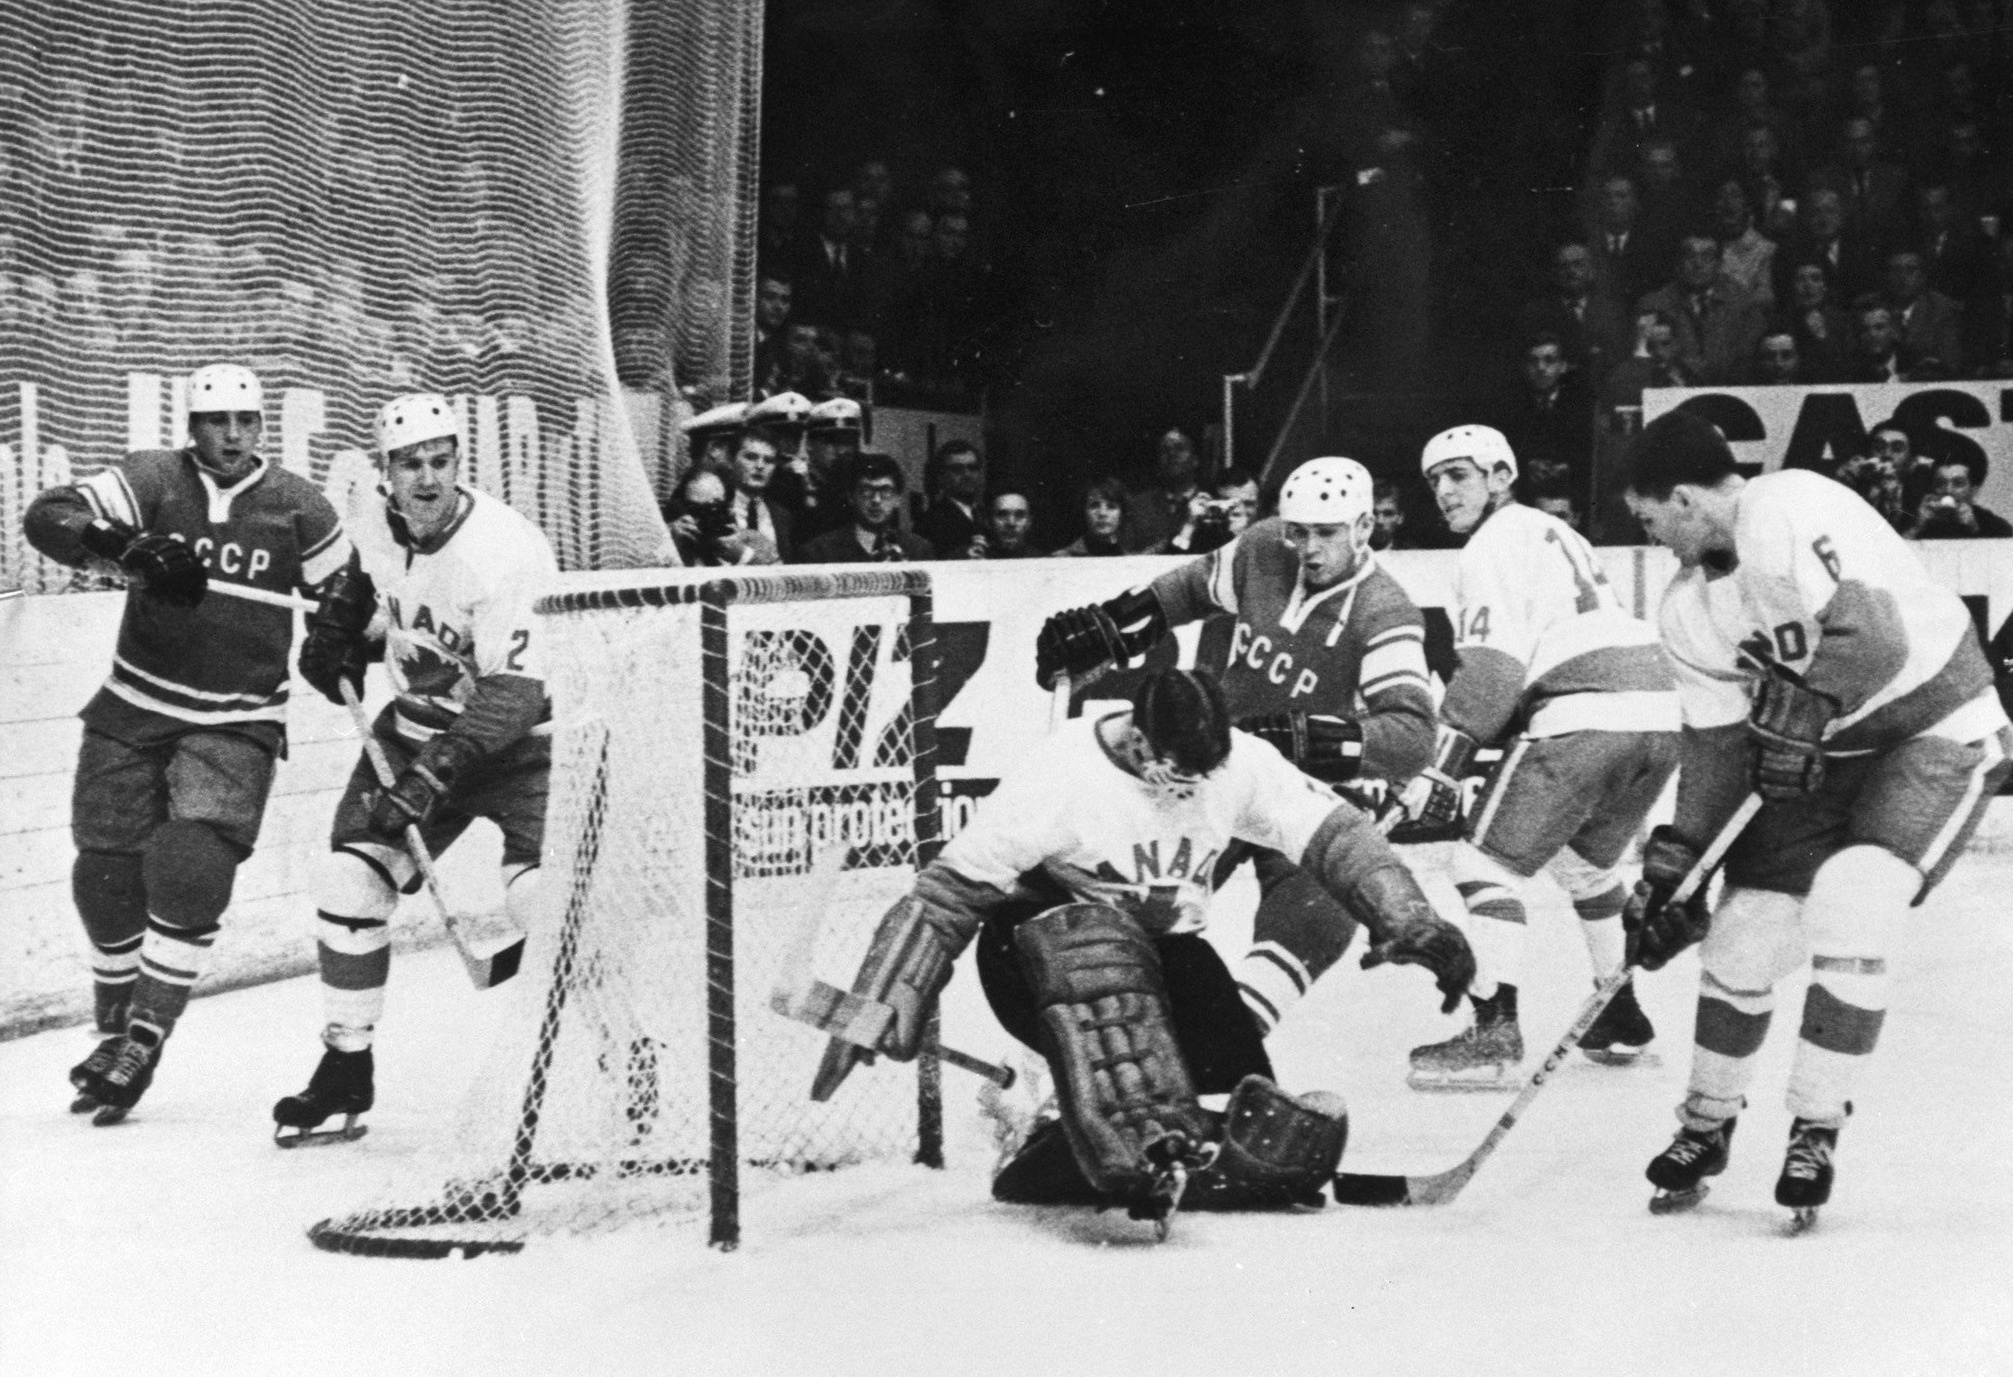 1967 World Ice Hockey Championships. From Wikipedia ... 382cee36a